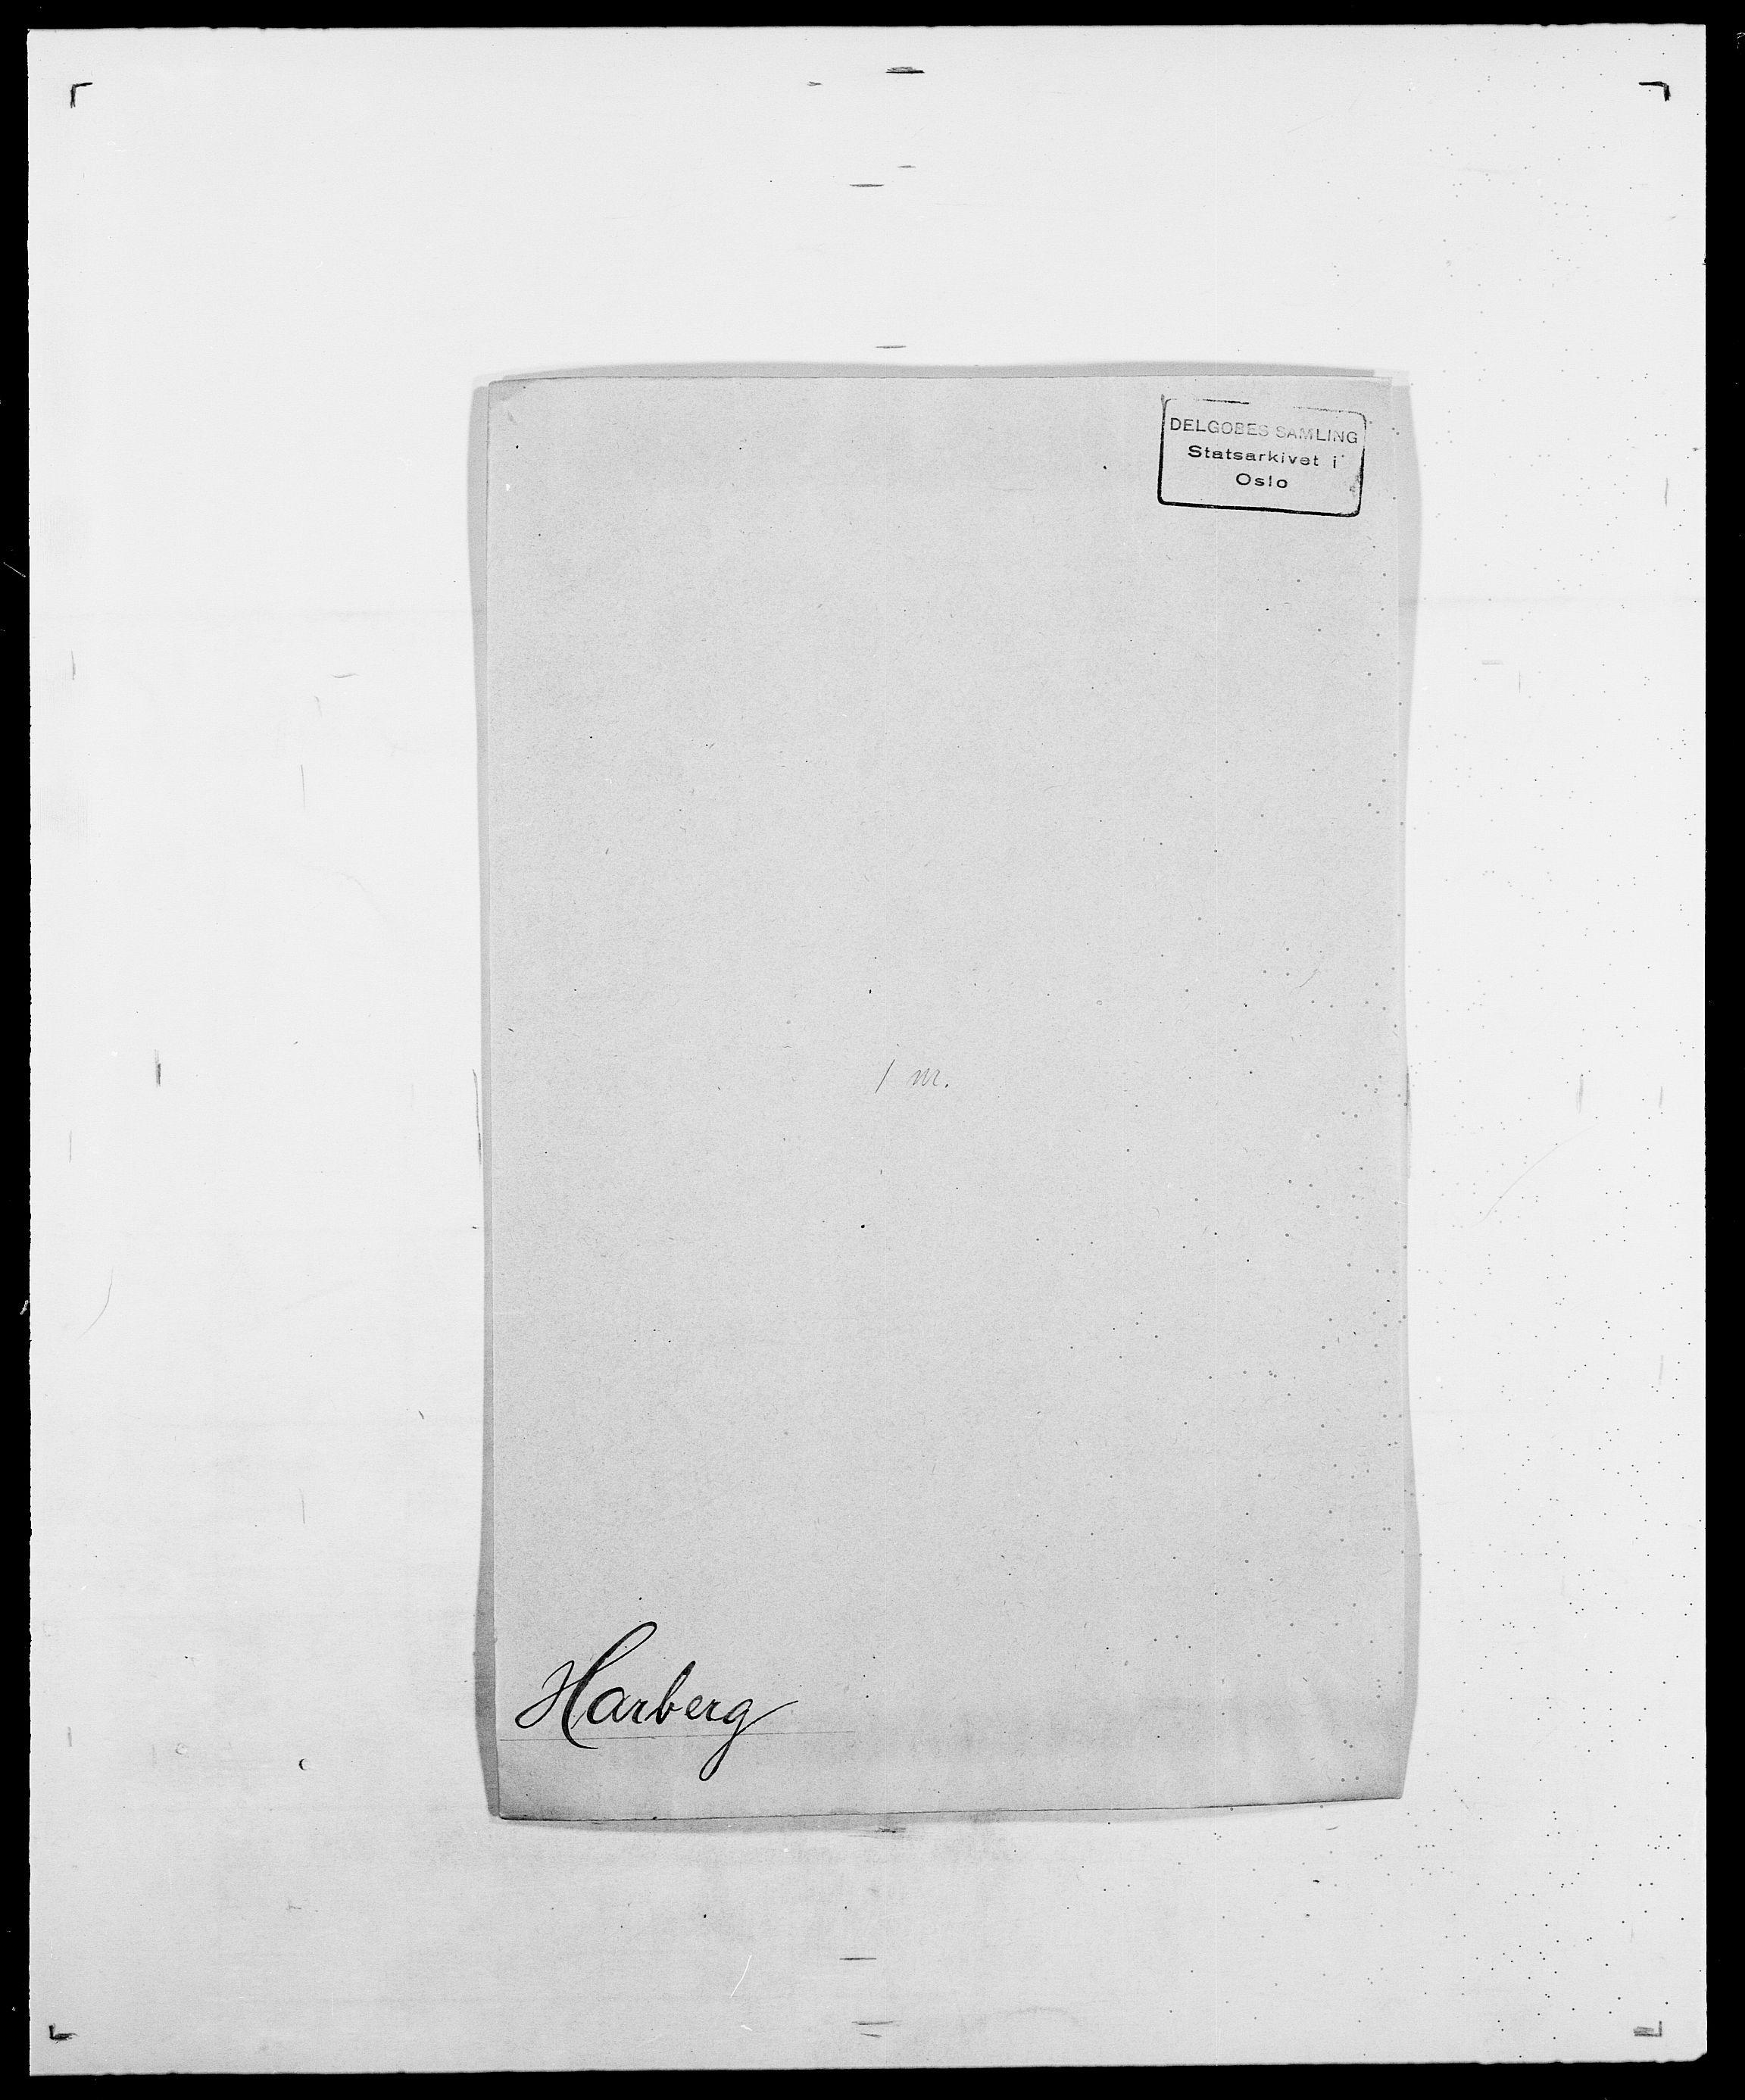 SAO, Delgobe, Charles Antoine - samling, D/Da/L0016: Hamborg - Hektoen, s. 369